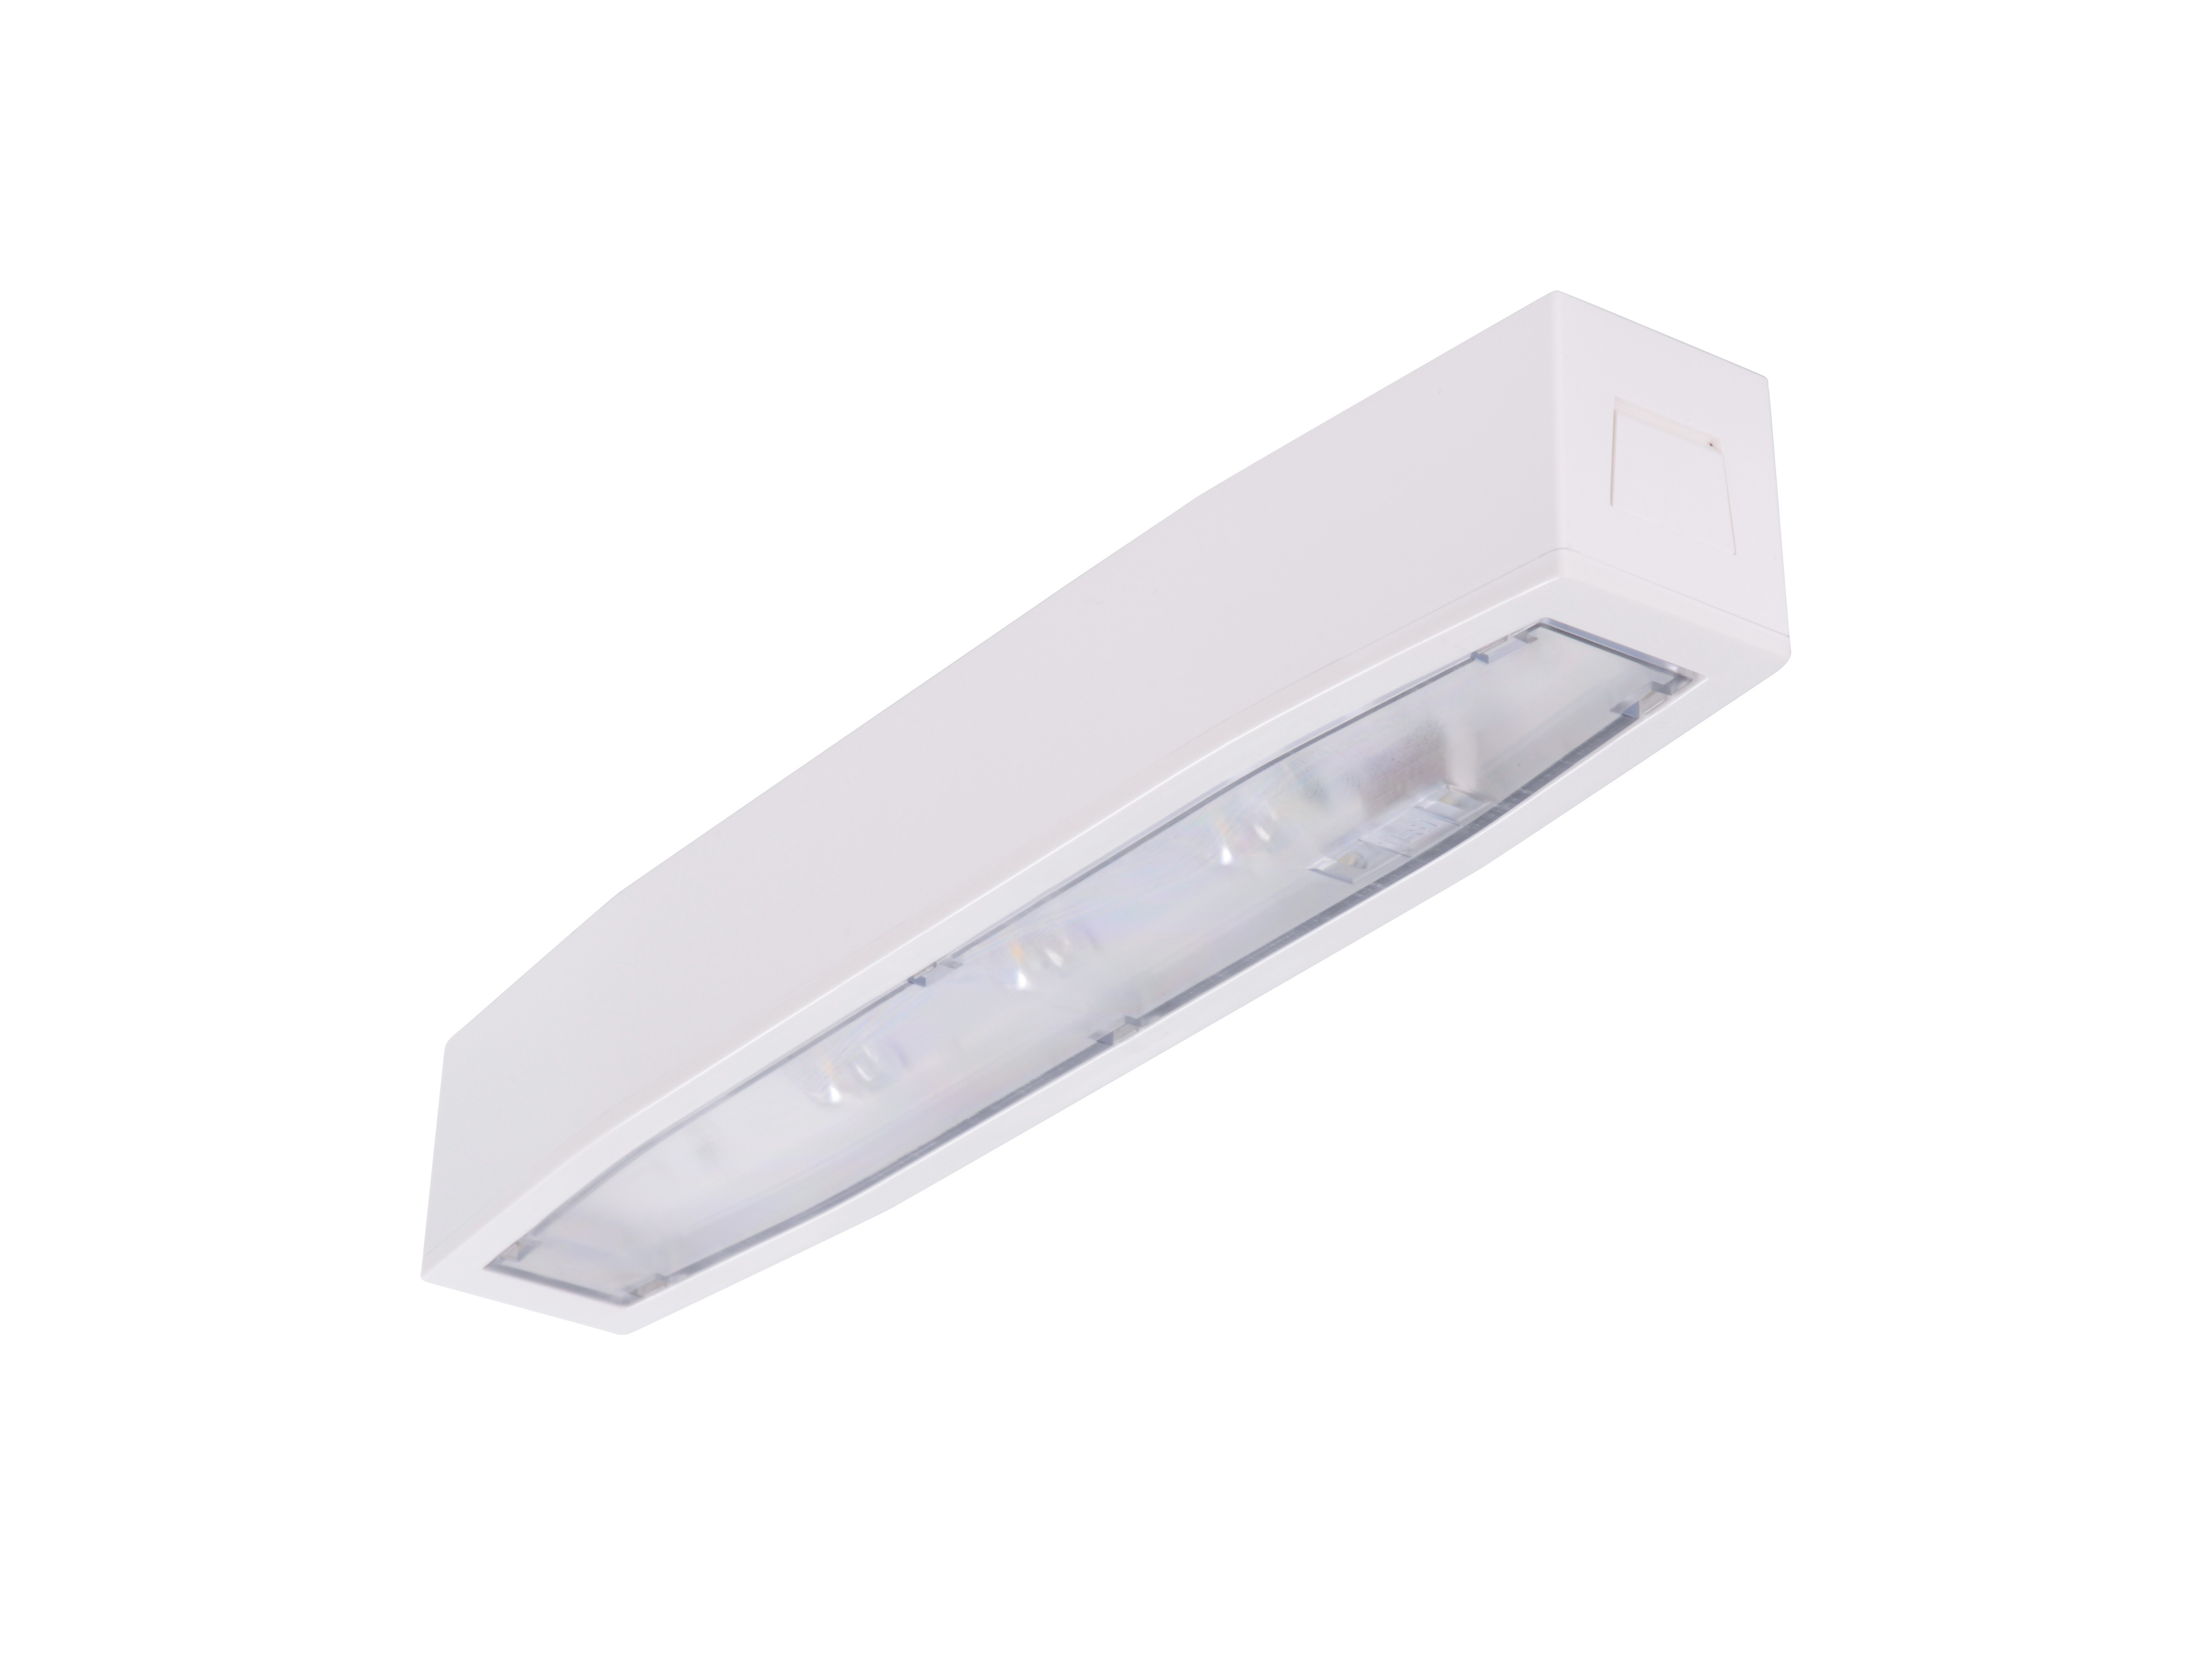 Lampa antipanica led Intelight 94554   3h mentinut test automat 0